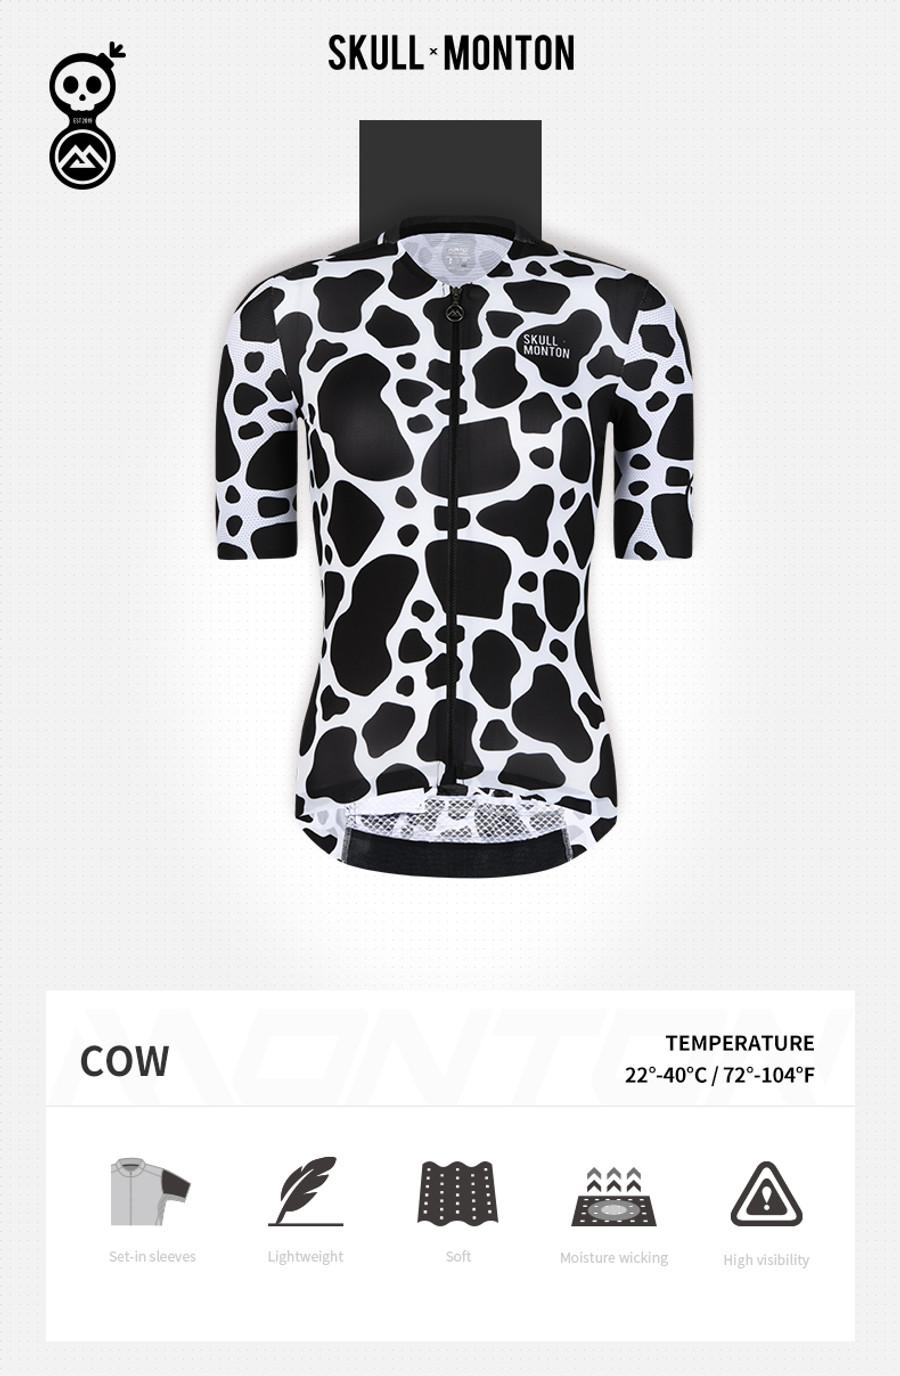 Women's Urban+ COW Jersey